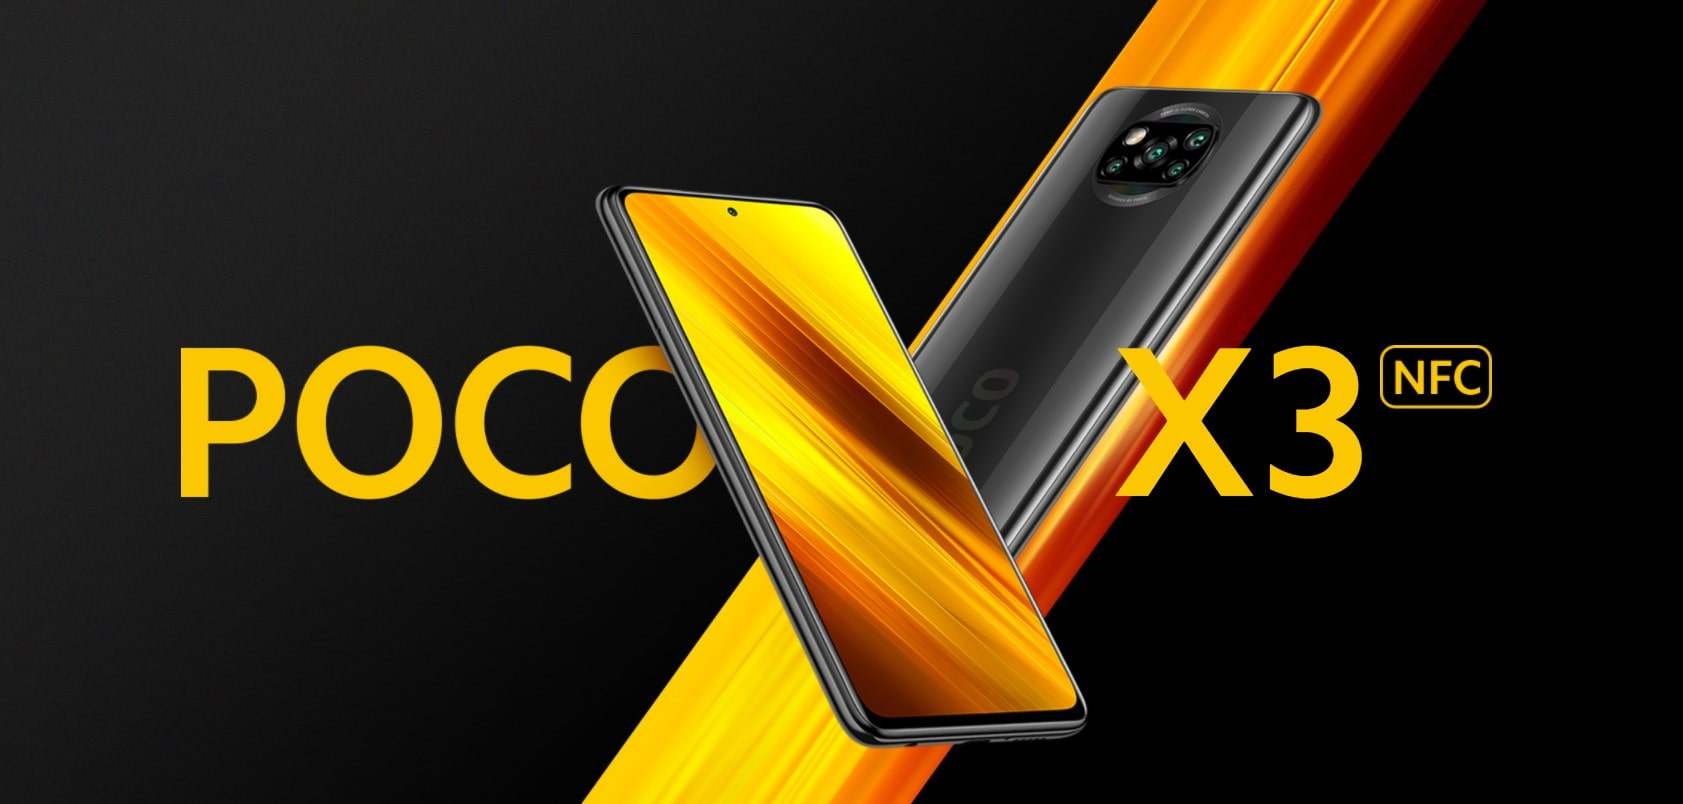 download POCO X3 NFC latest OTA update miui